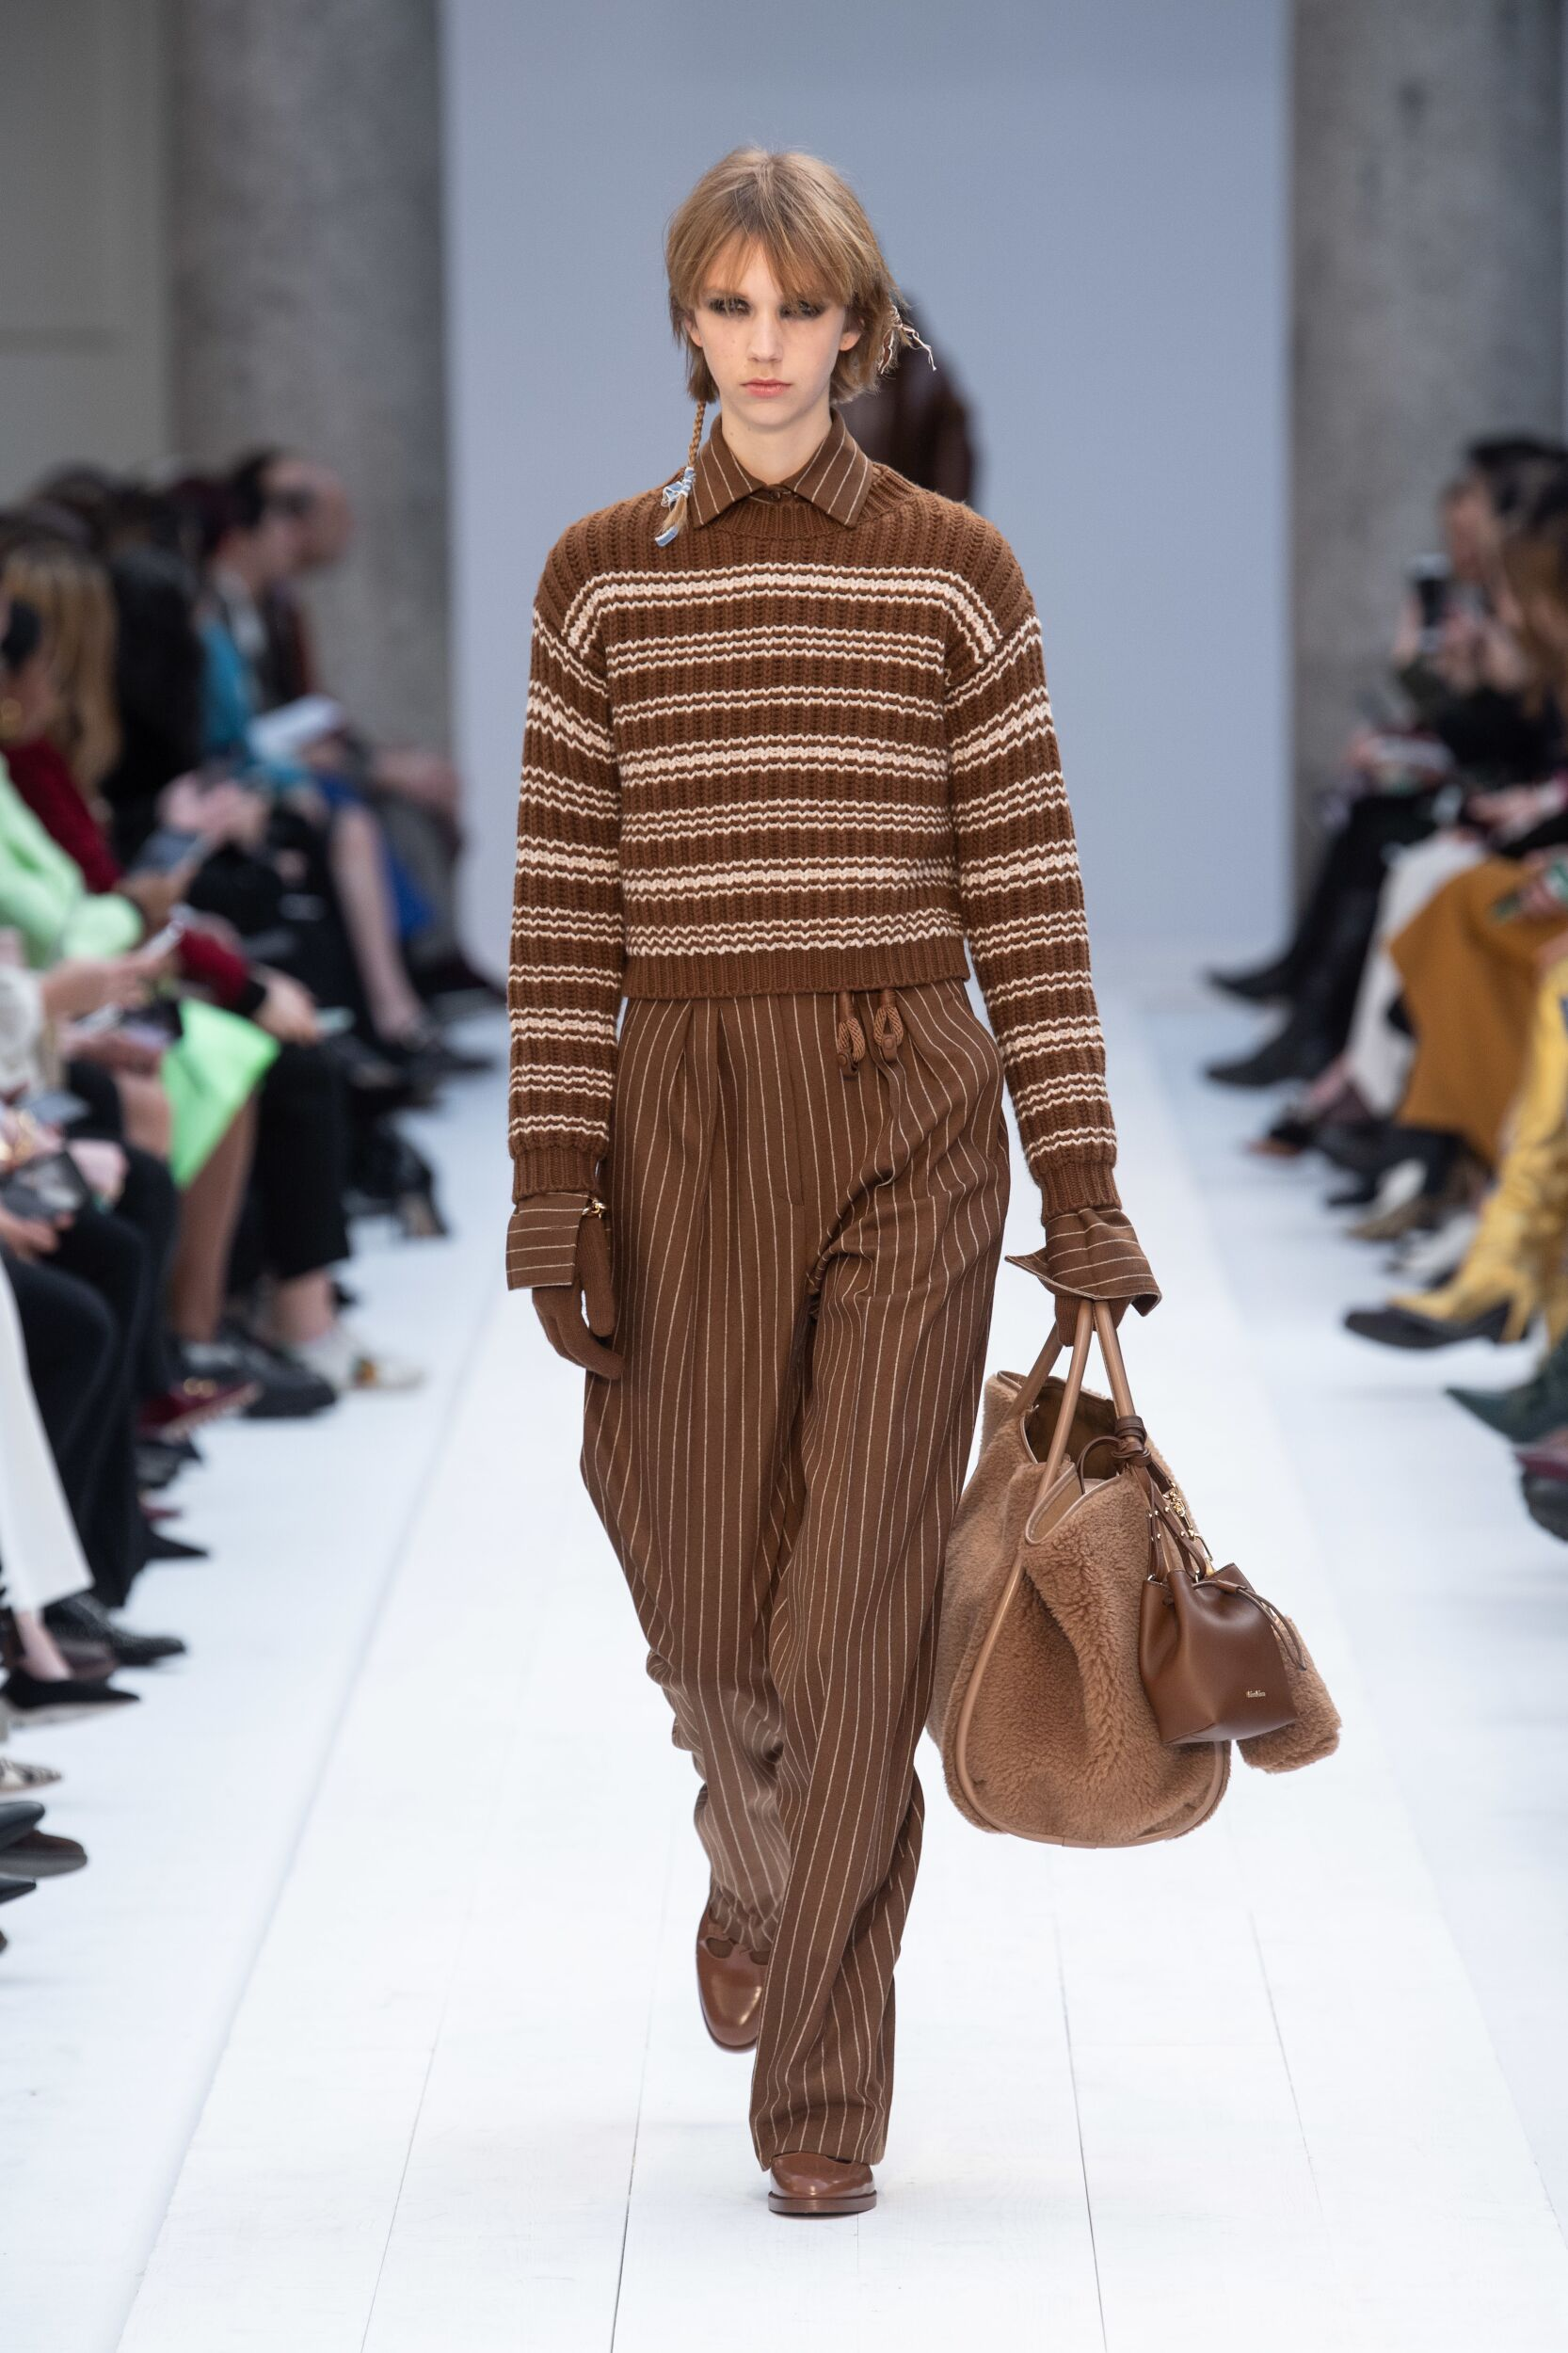 Catwalk Max Mara Women Fashion Show Winter 2020